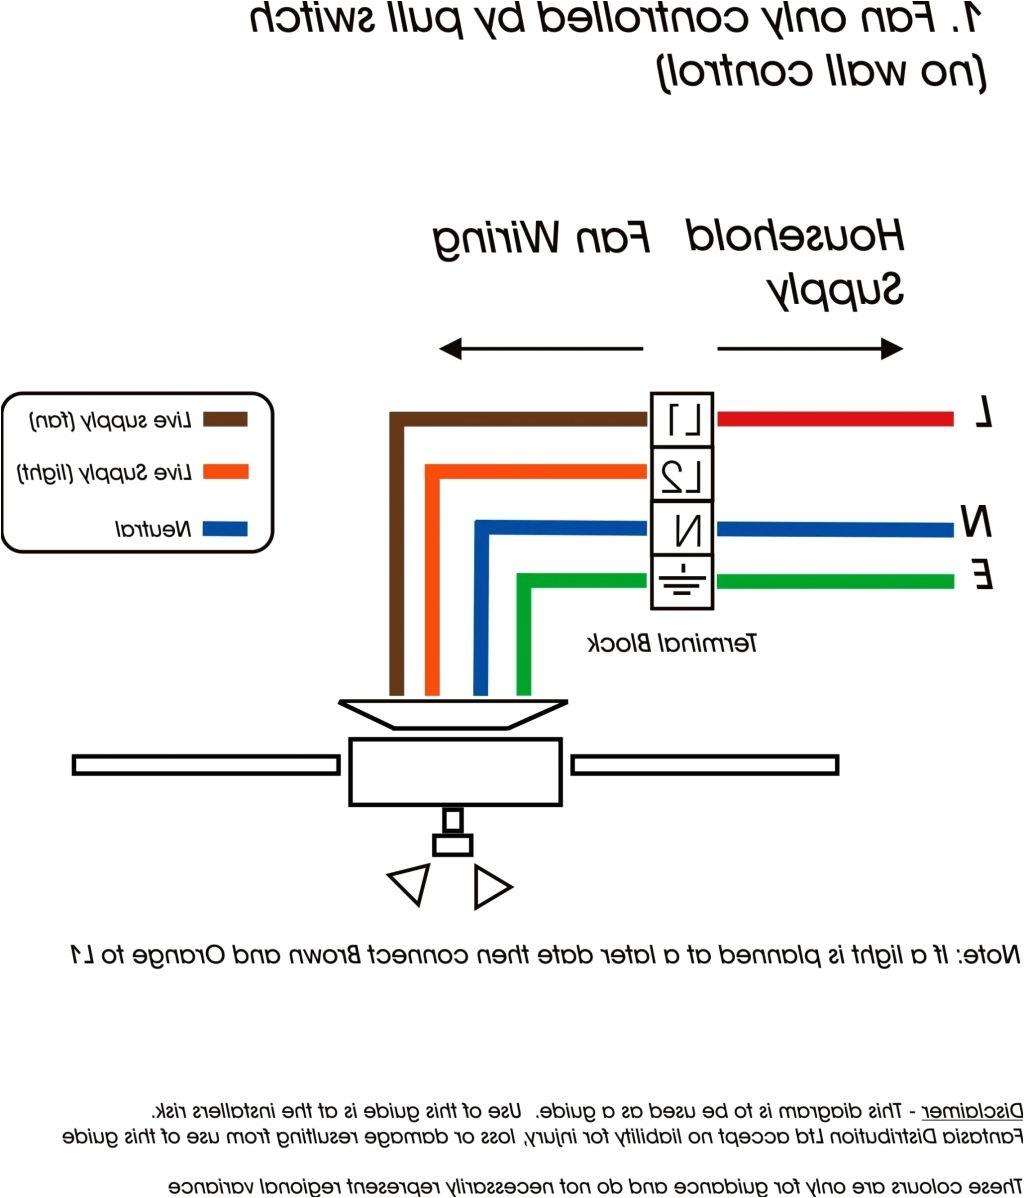 ceiling fan wiring diagram 3 speed wiring diagram hunter fan wiring diagram luxury 3 speed